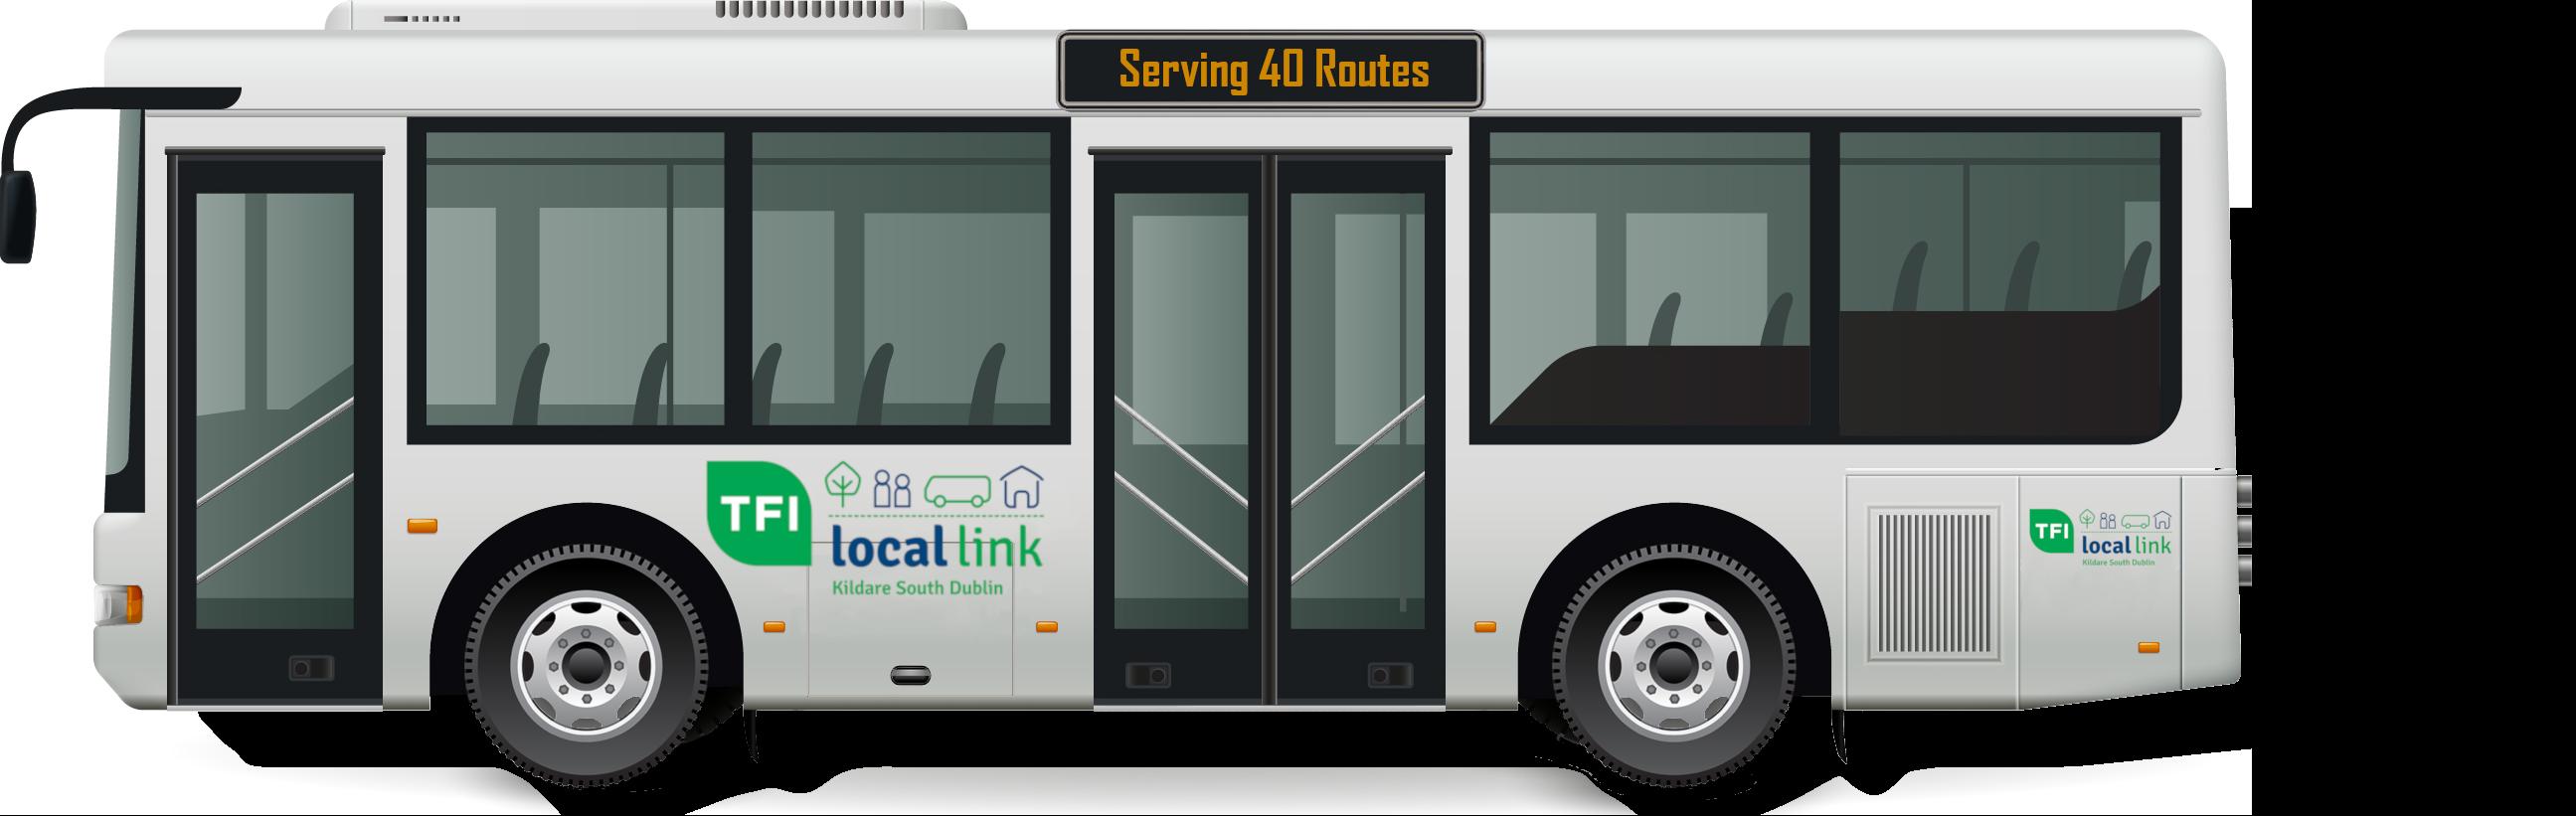 Local Link Bus TFI Kildare South Dublin